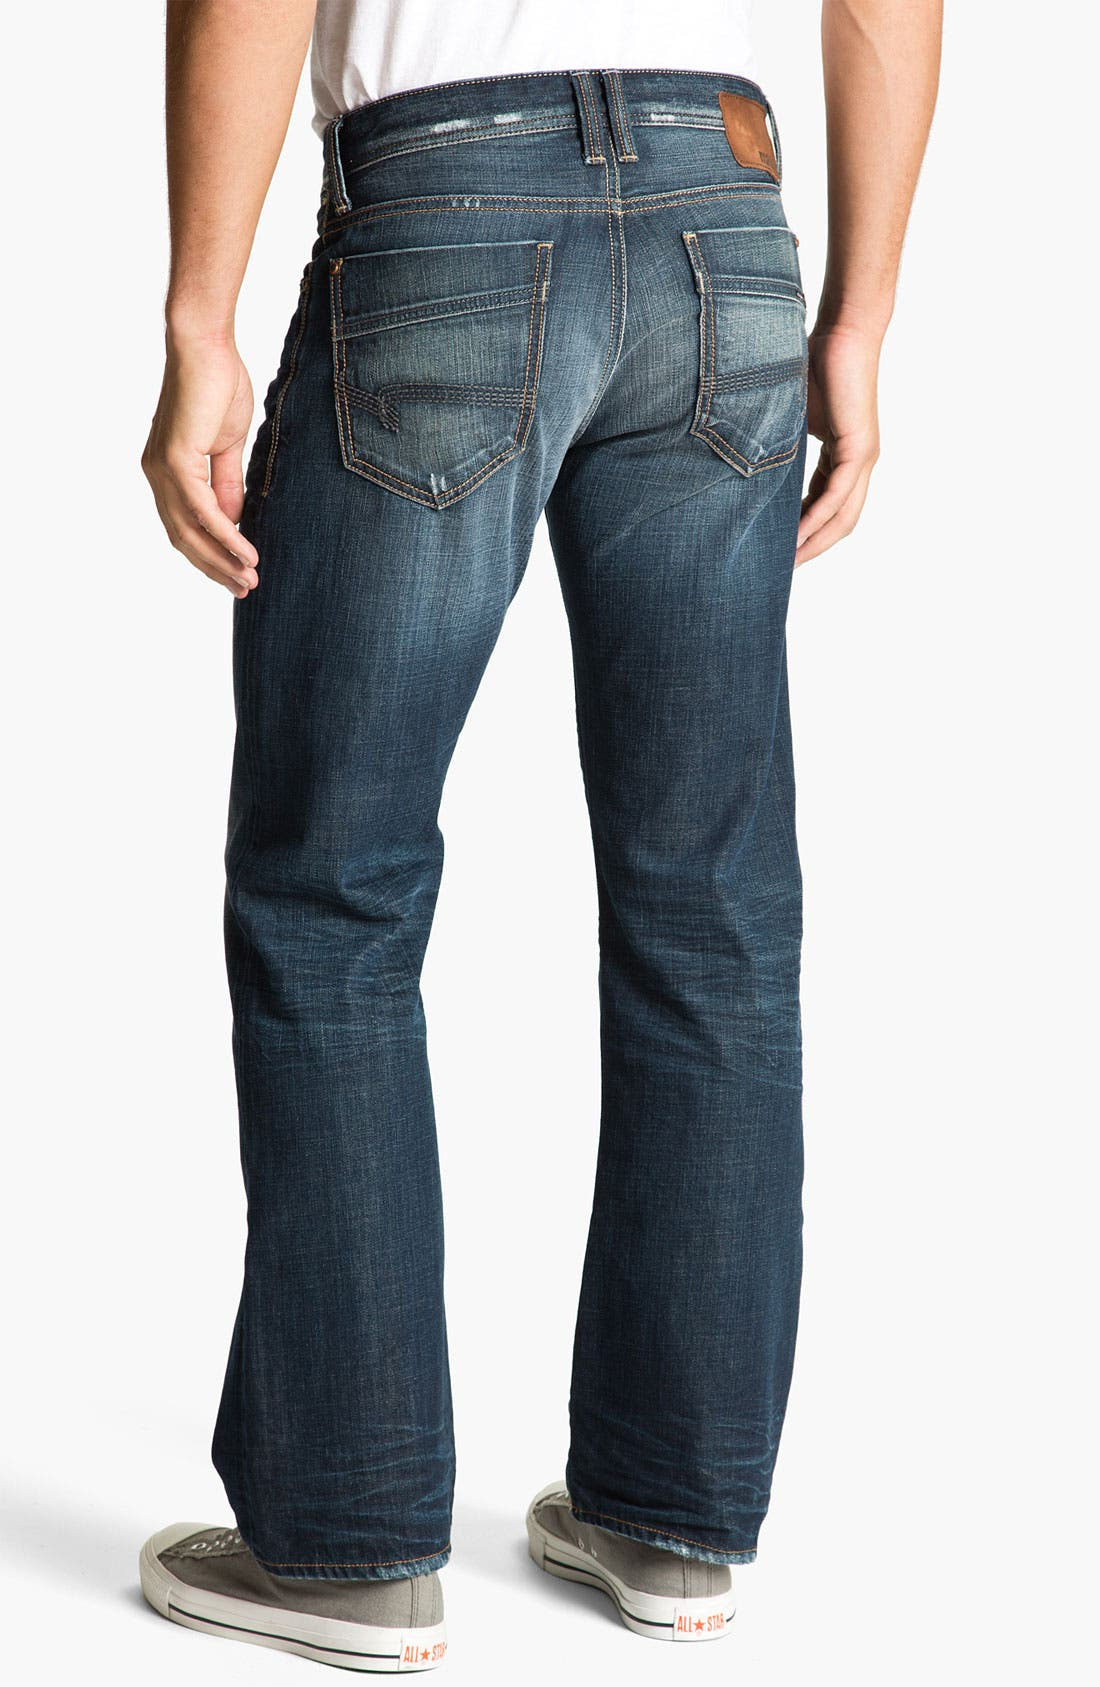 Main Image - Mavi Jeans 'Josh' Bootcut Jeans (Deep Indigo American Vintage)